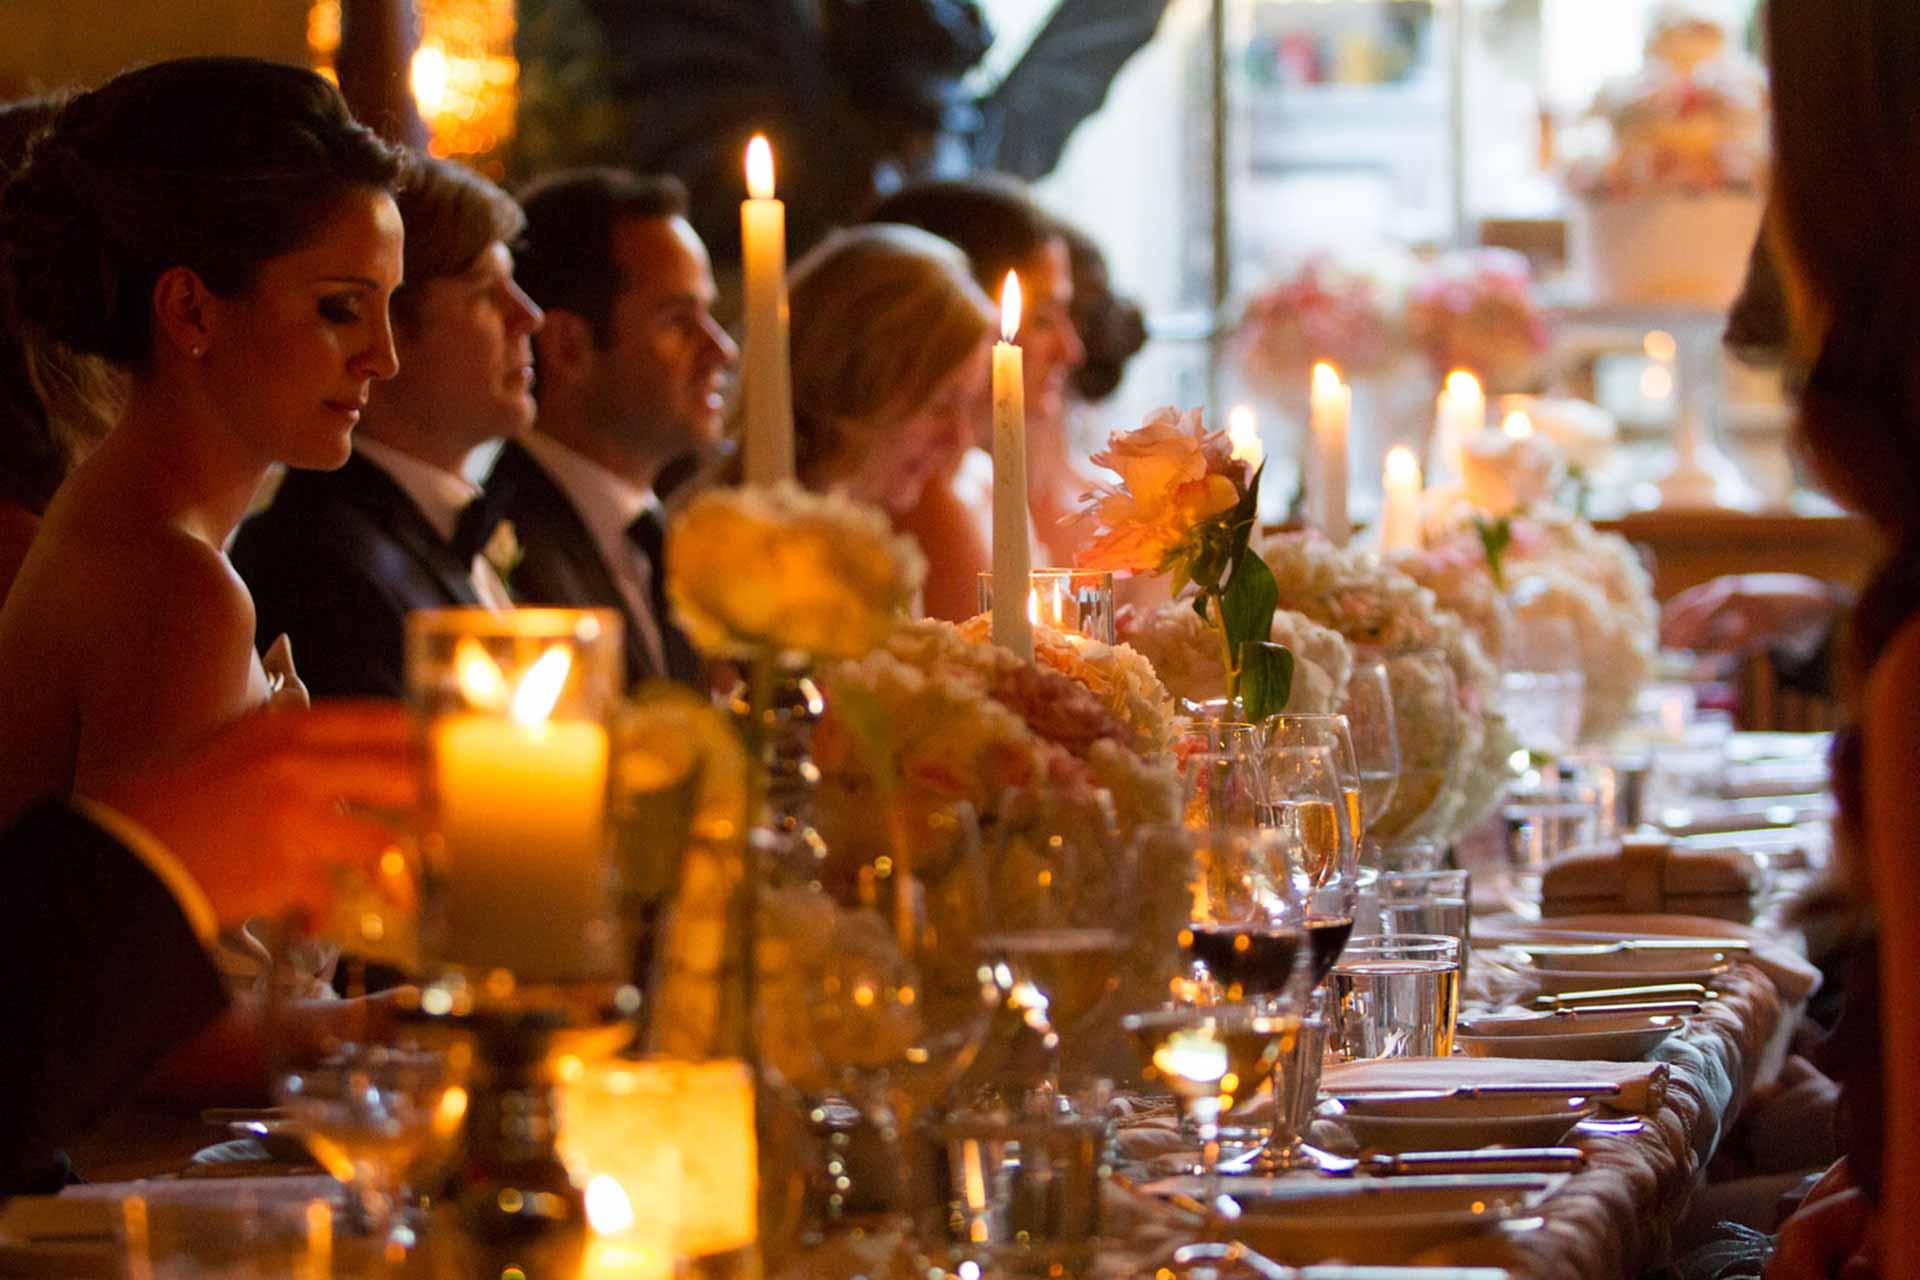 Toronto Wedding Venue - Elegant Restaurant Reception - Tablescape